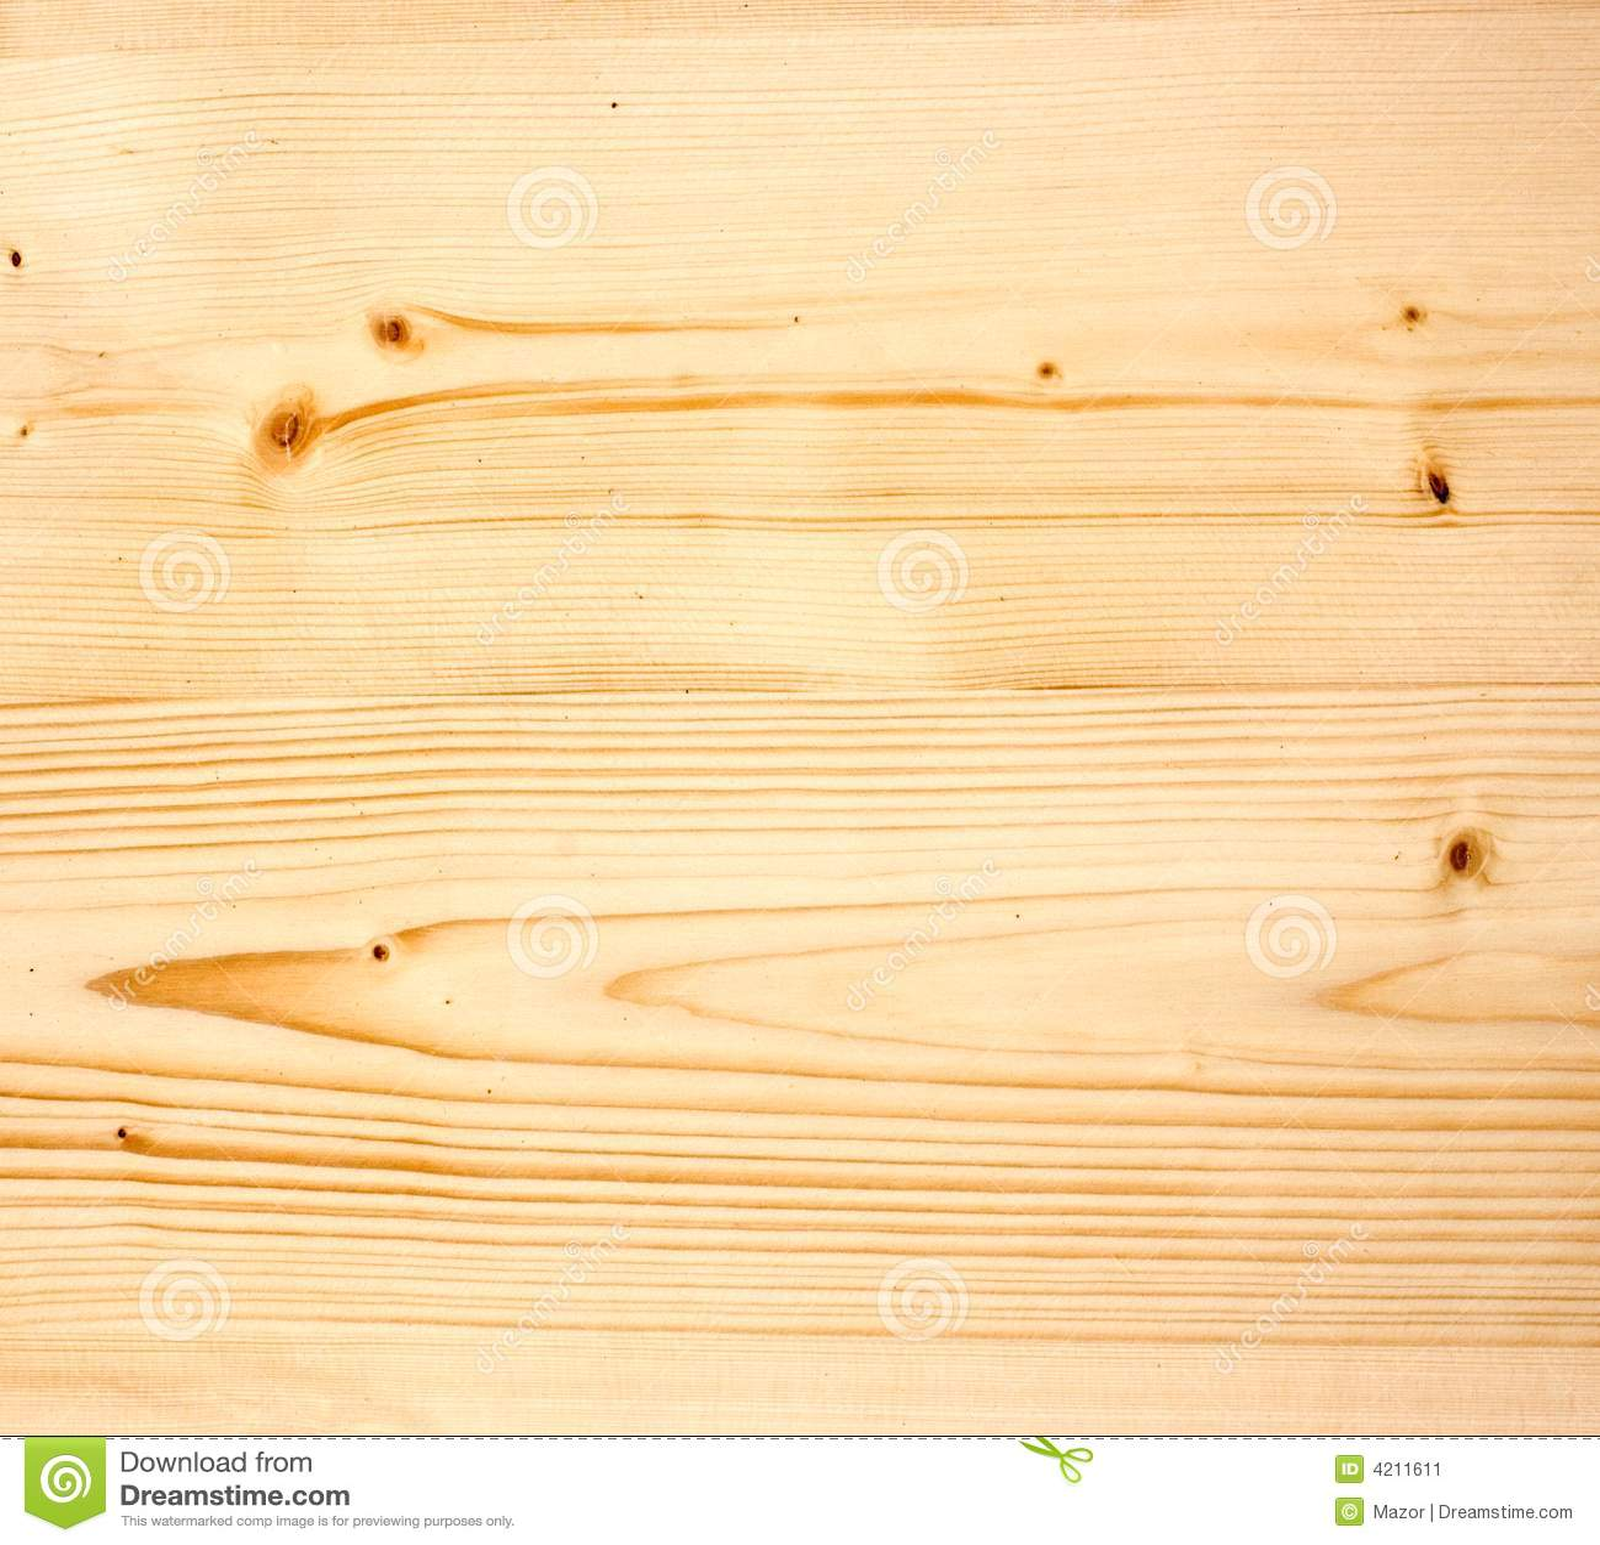 4 X 4 plywood